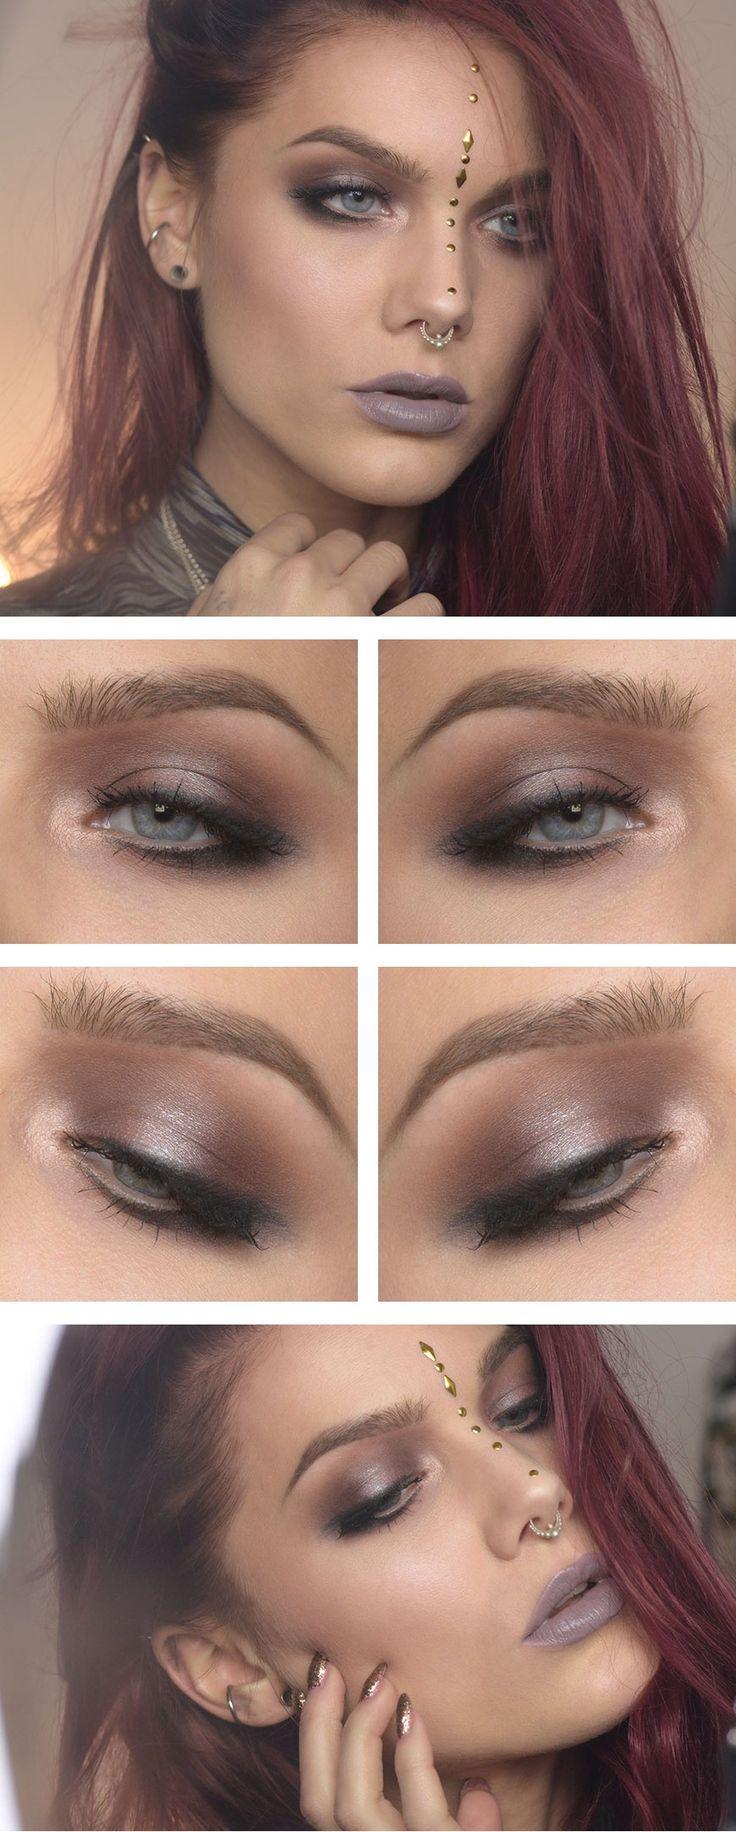 Jag har använt/I've used Too faced shadow insurance Too faced Chocolate bar eyeshadow palette MAC Eyeshadow...